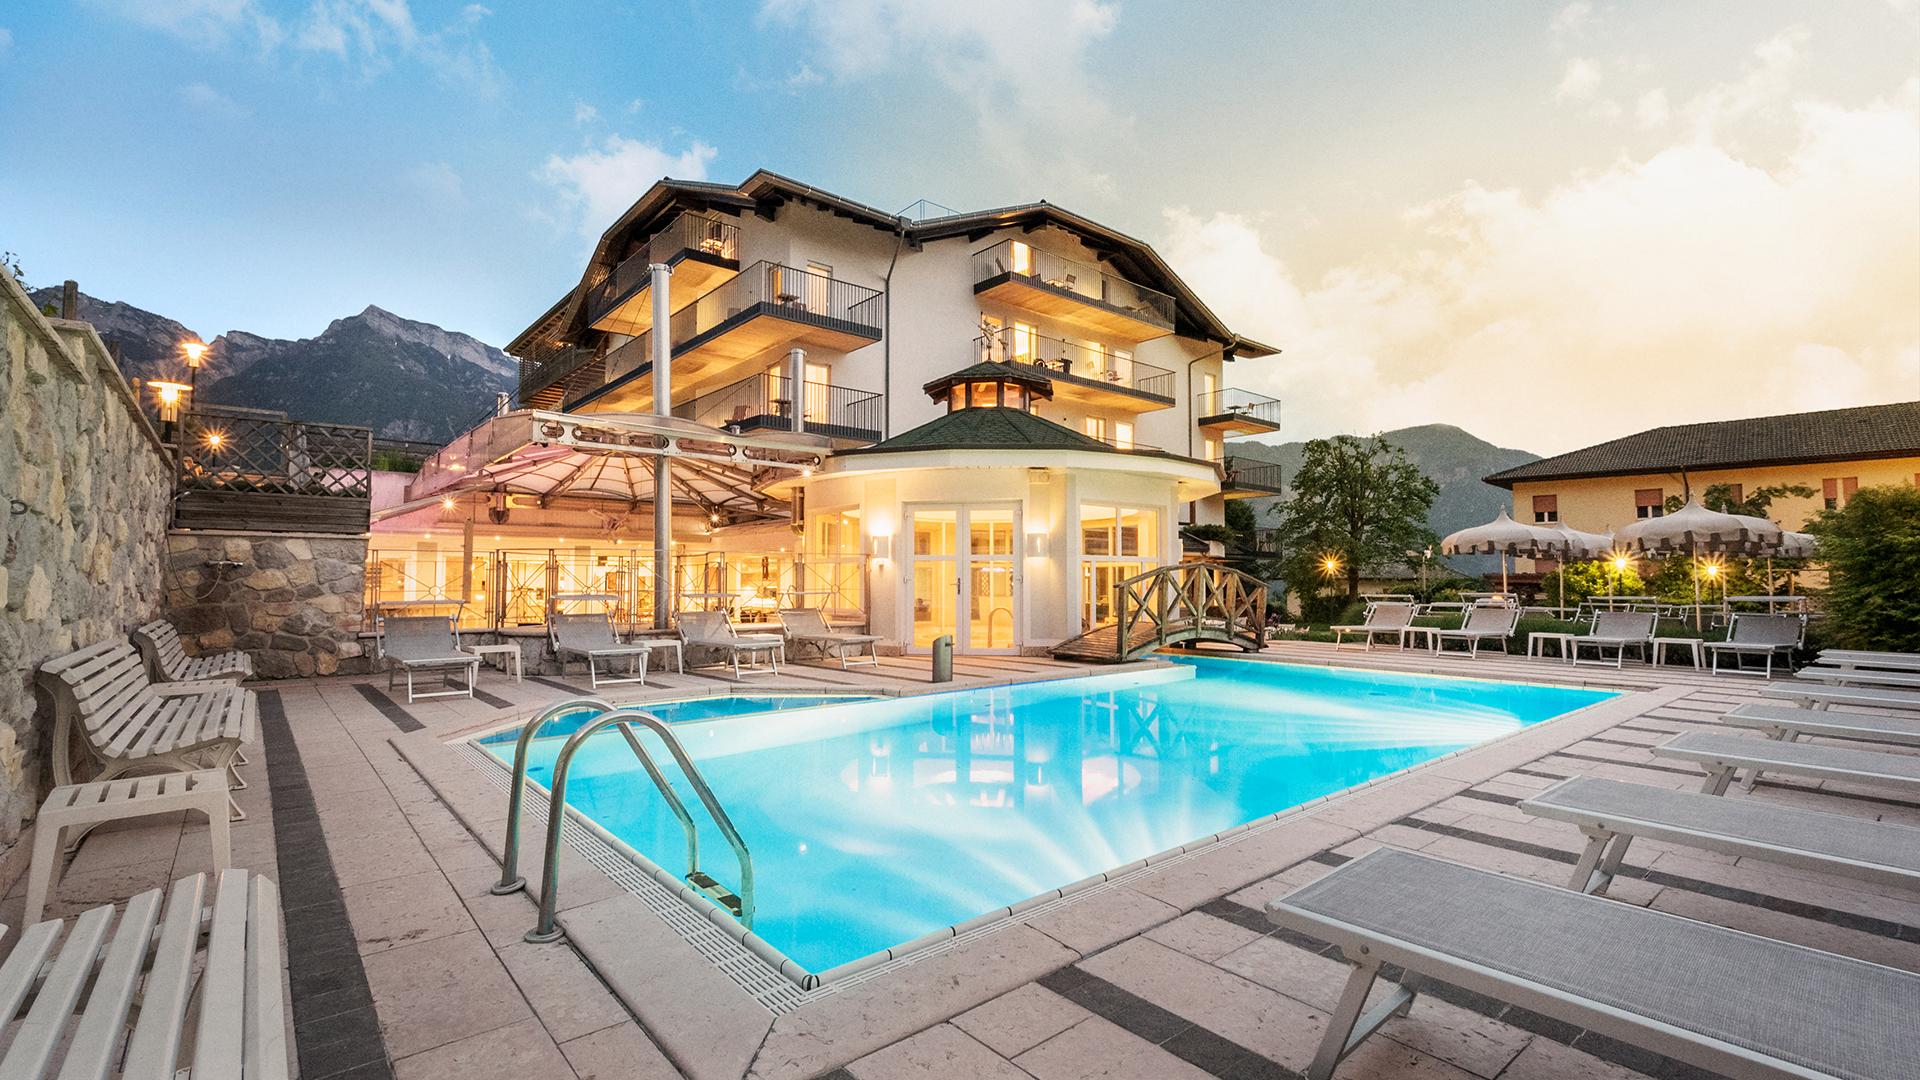 Sport&Wellness Hotel Cristallo am Levicosee